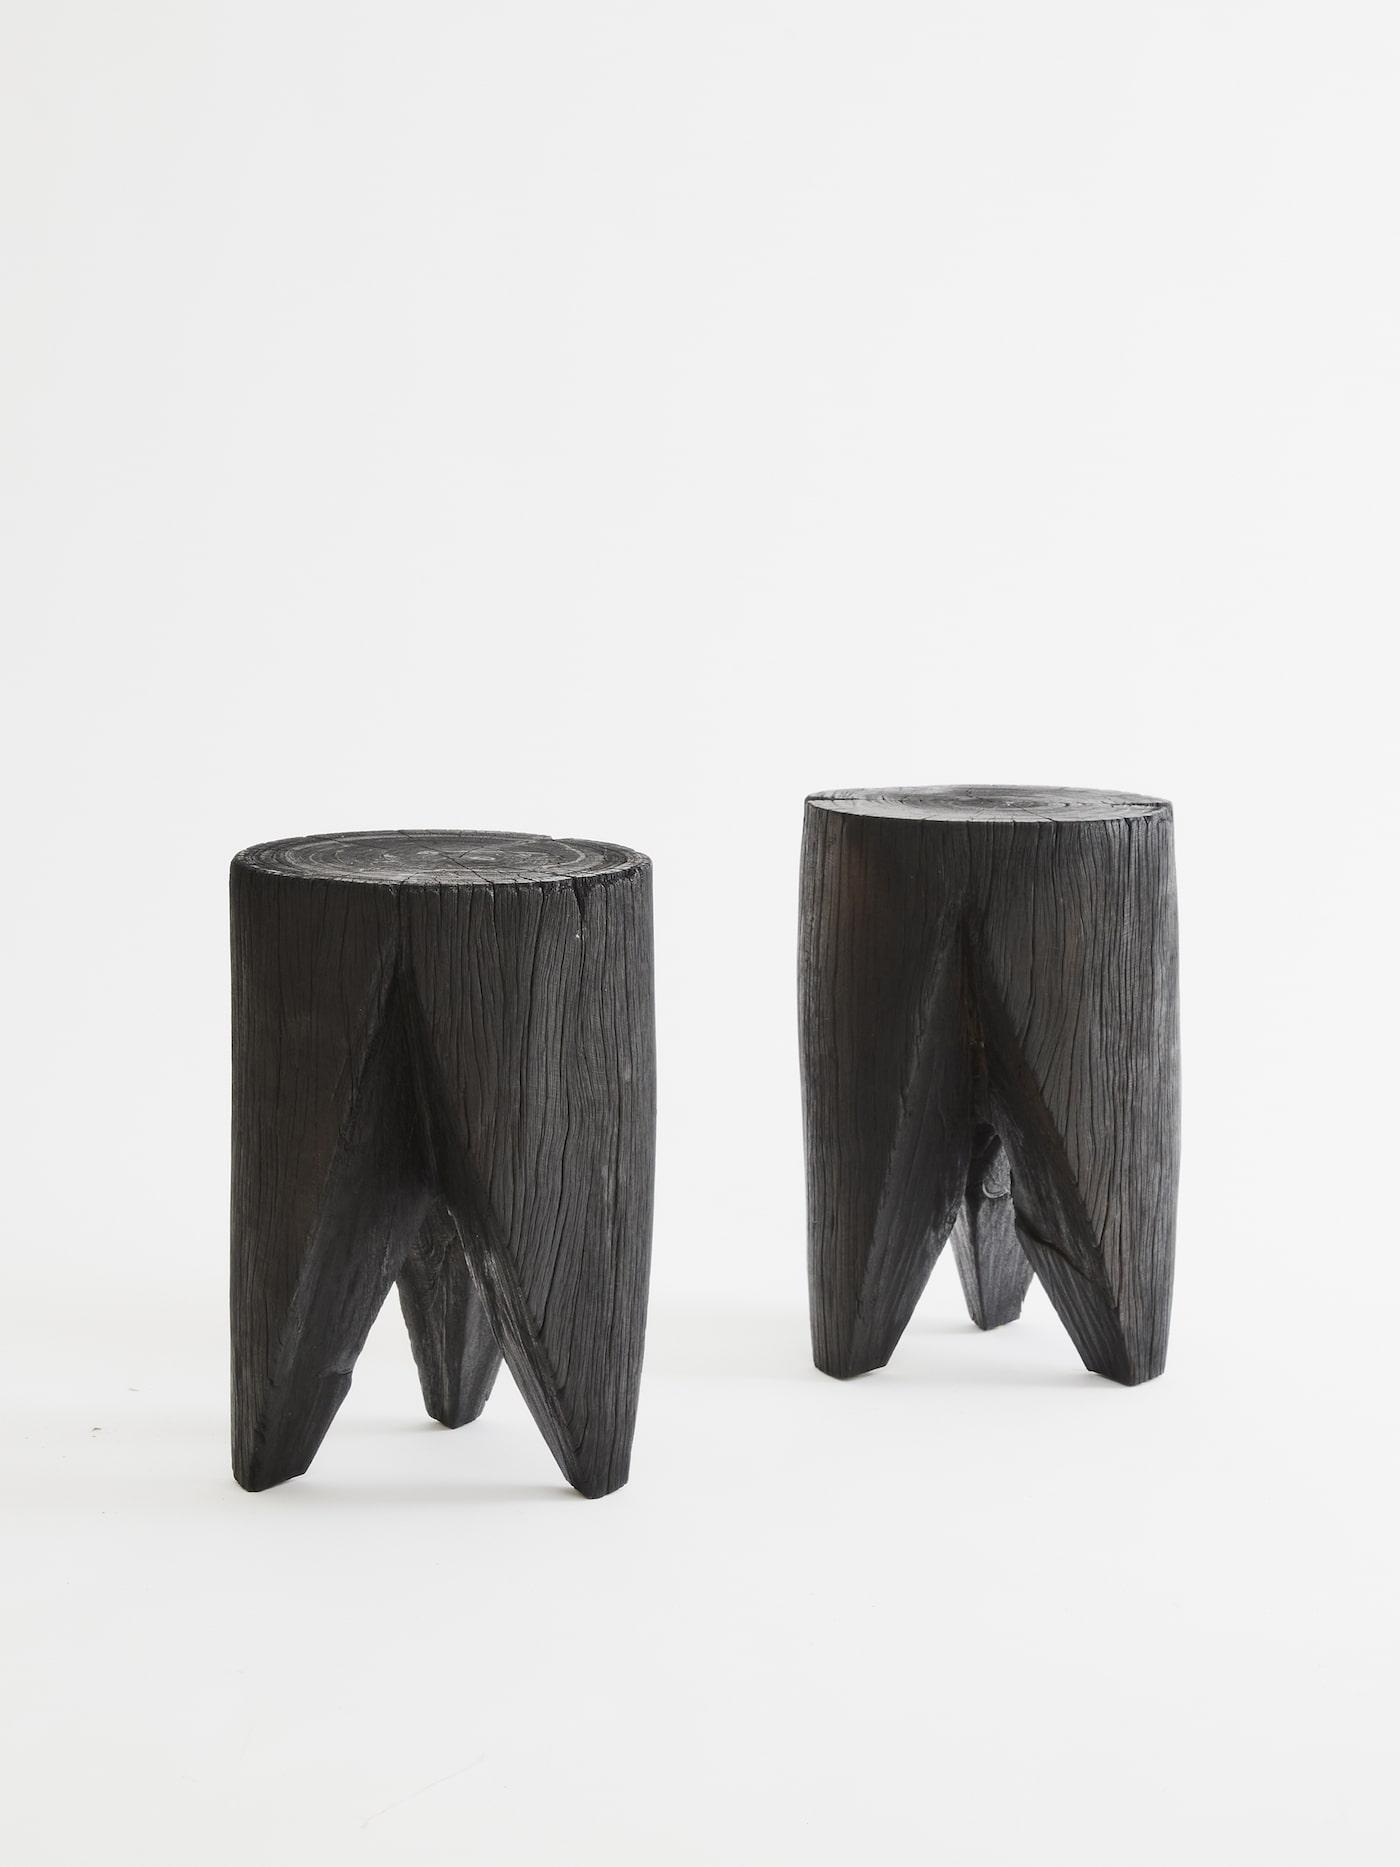 Black timber Telegraph stools